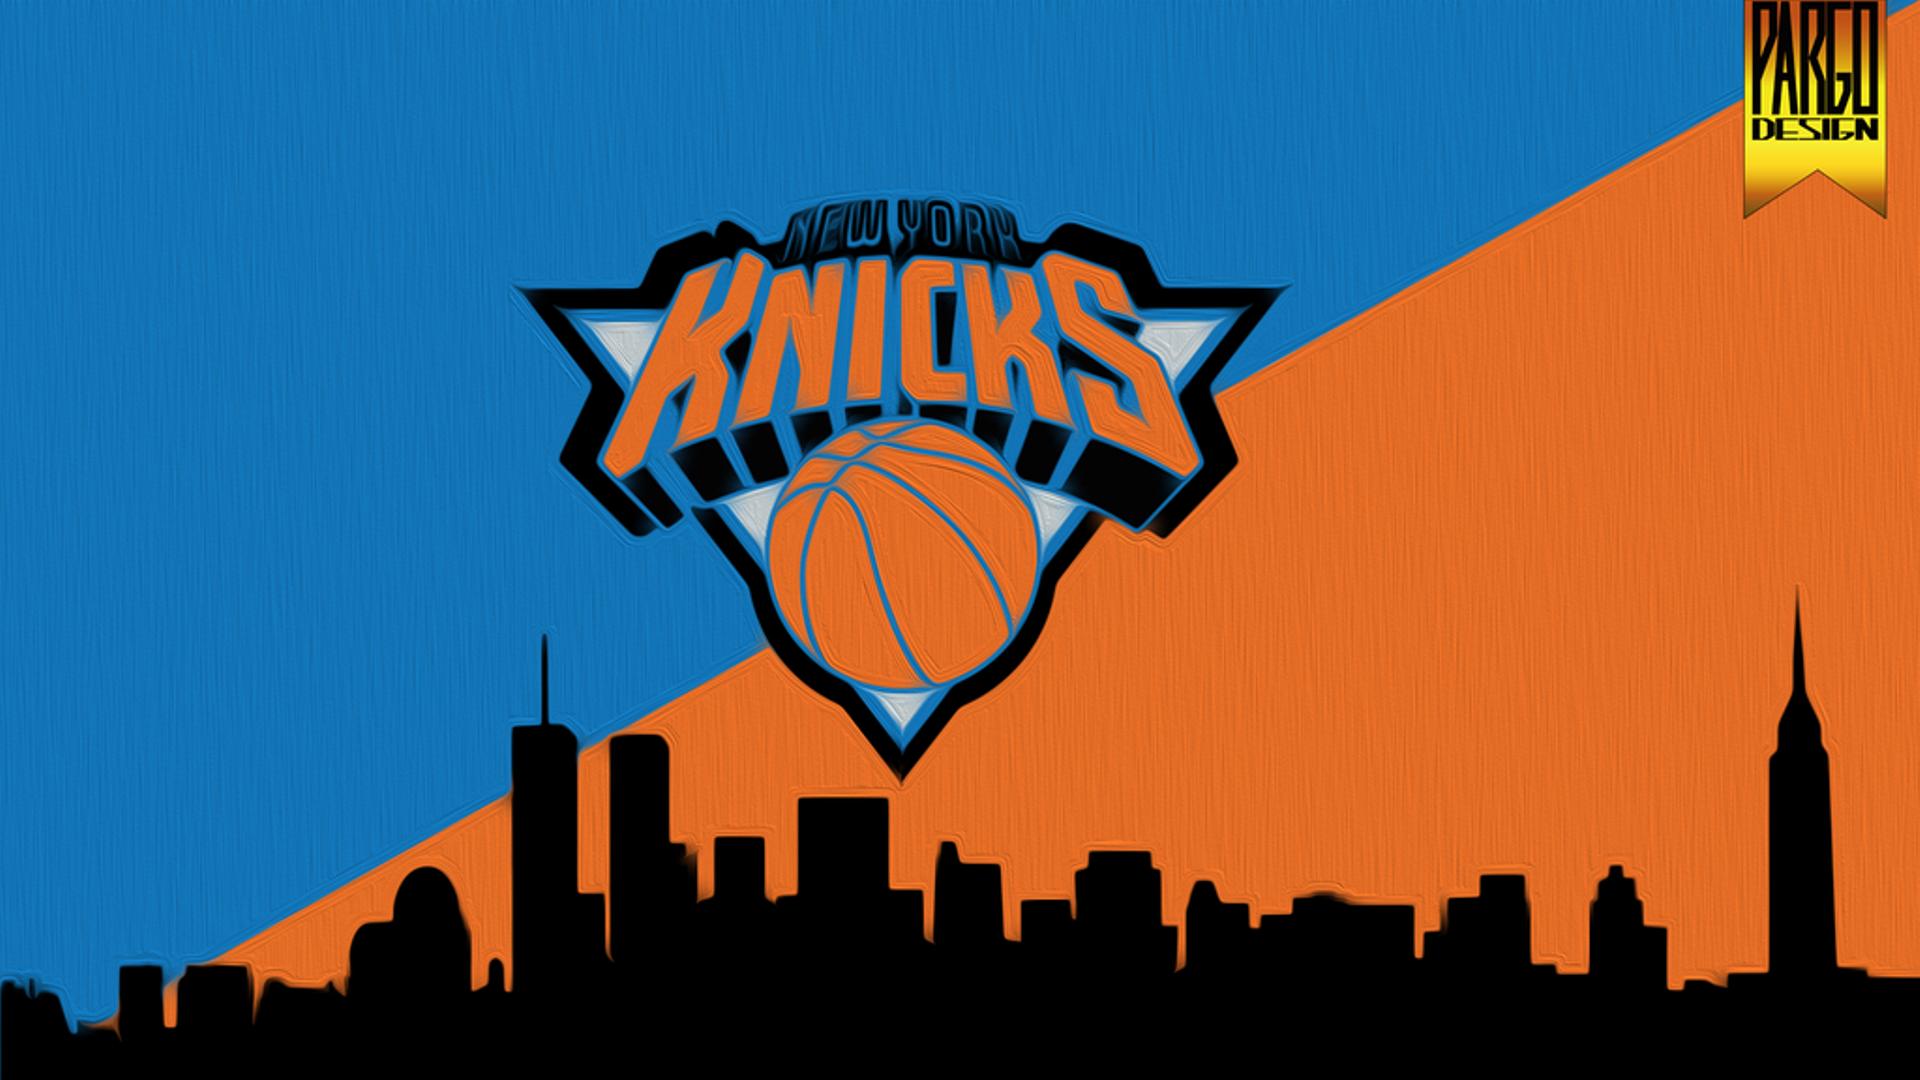 New York Knicks Wallpaper 壁紙